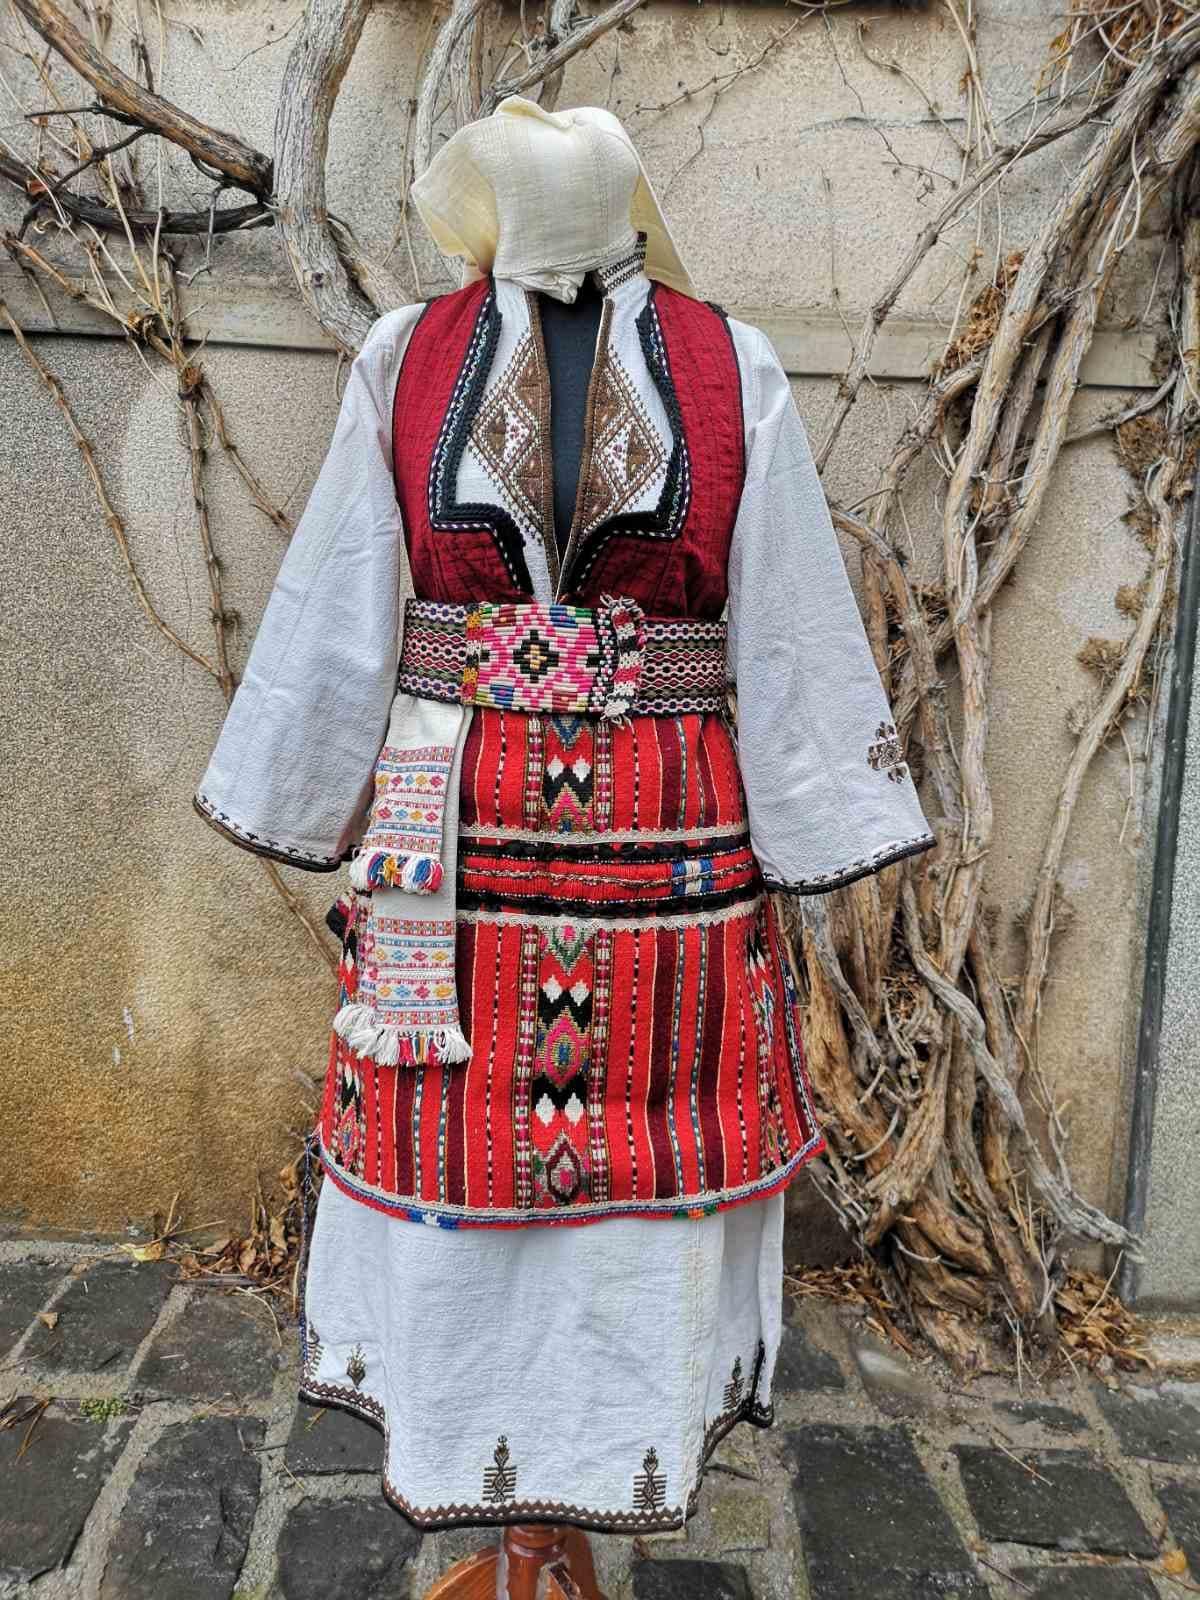 Vintage Aprons, Retro Aprons, Old Fashioned Aprons & Patterns Womens Ethic Costume, Detailed Long Shirt, Rare Apron, Ethnic Costume From Skopska Blatija Region $550.00 AT vintagedancer.com